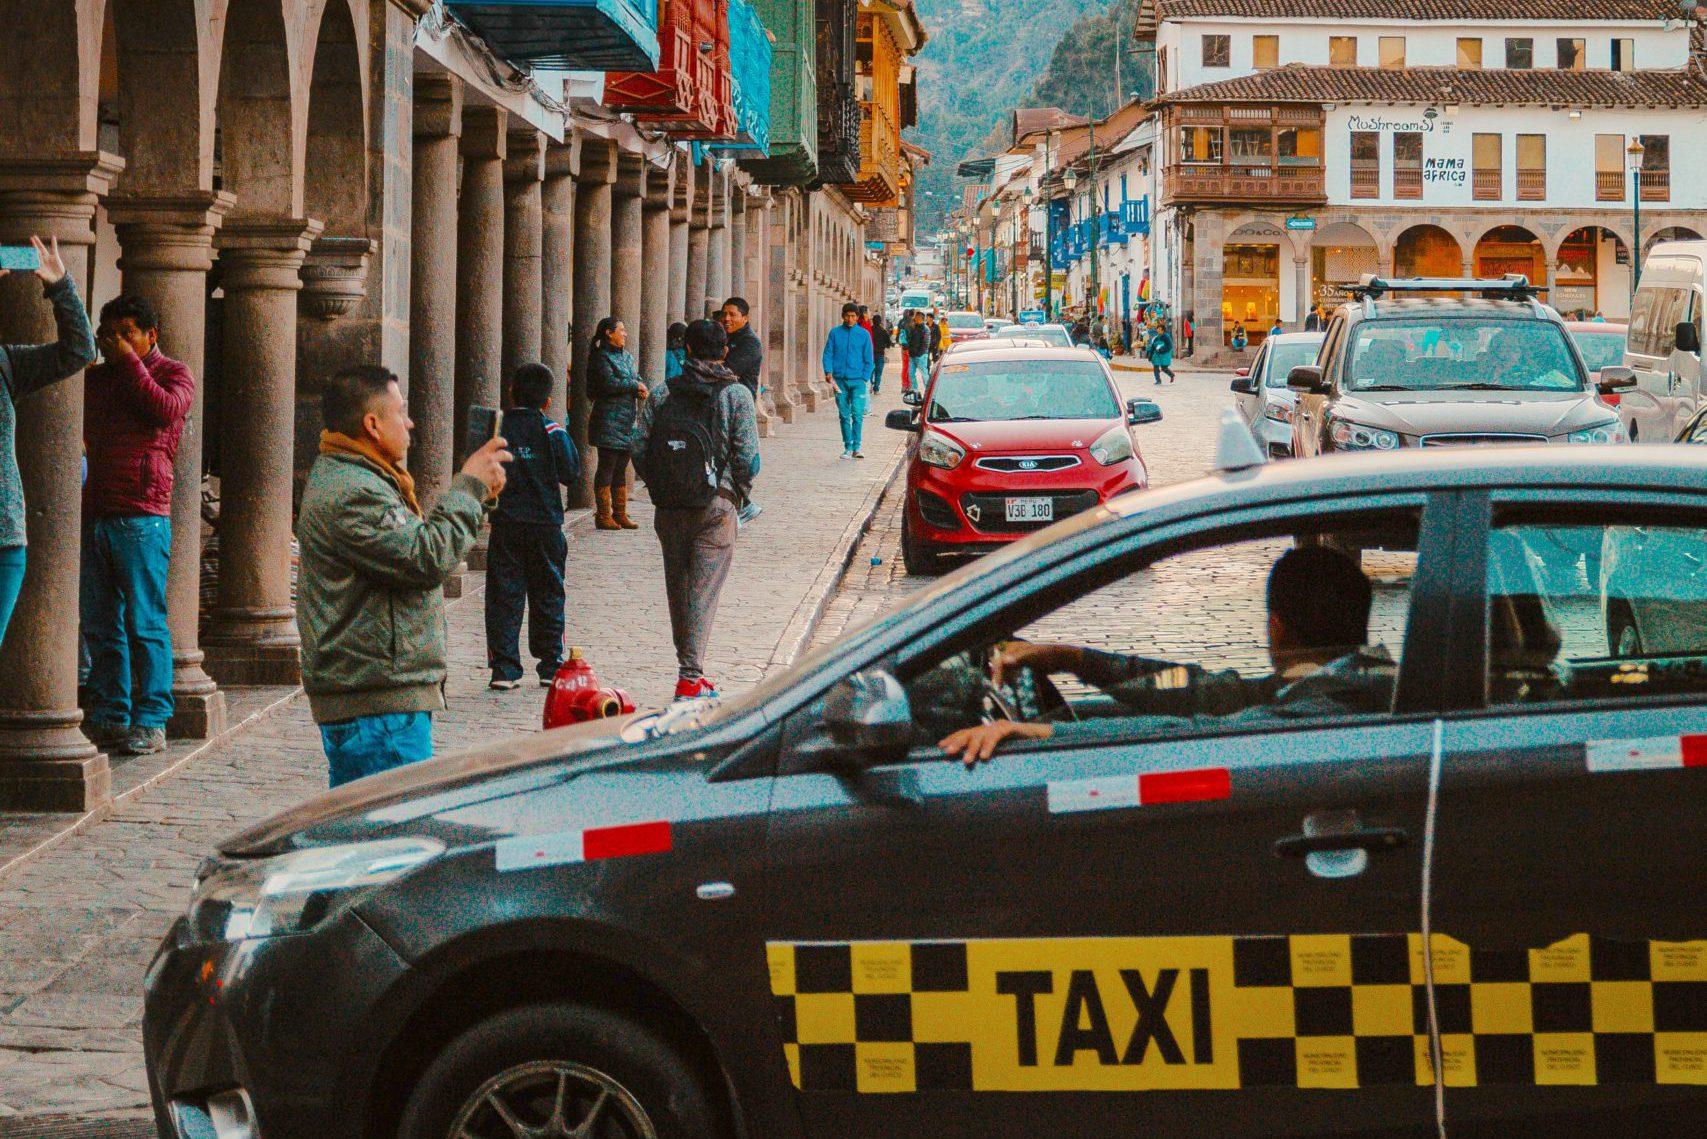 Taxi Shuttle 02 - Peru Quechuas Lodge Ollantaytambo